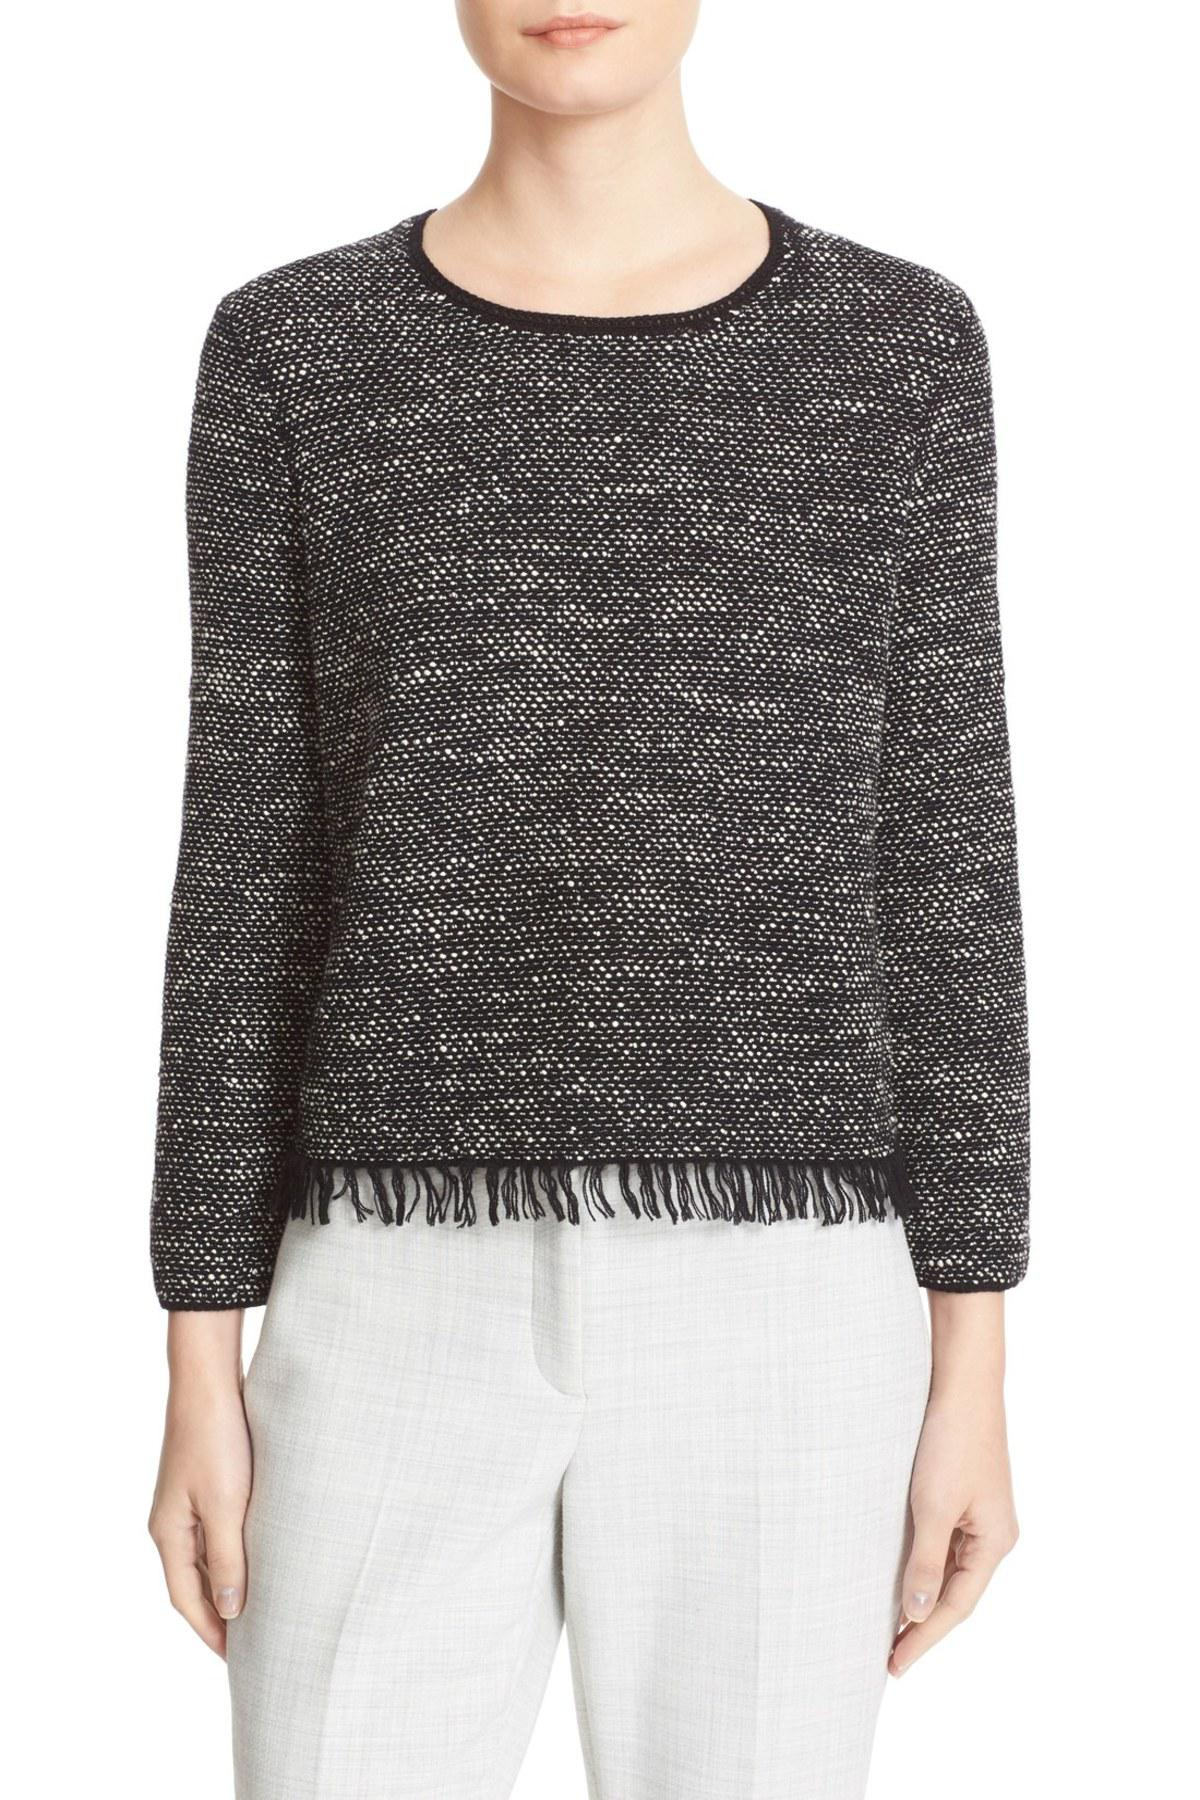 Black Sweater Fringe Lyst Tweed Vendla In Theory PBqSUwz